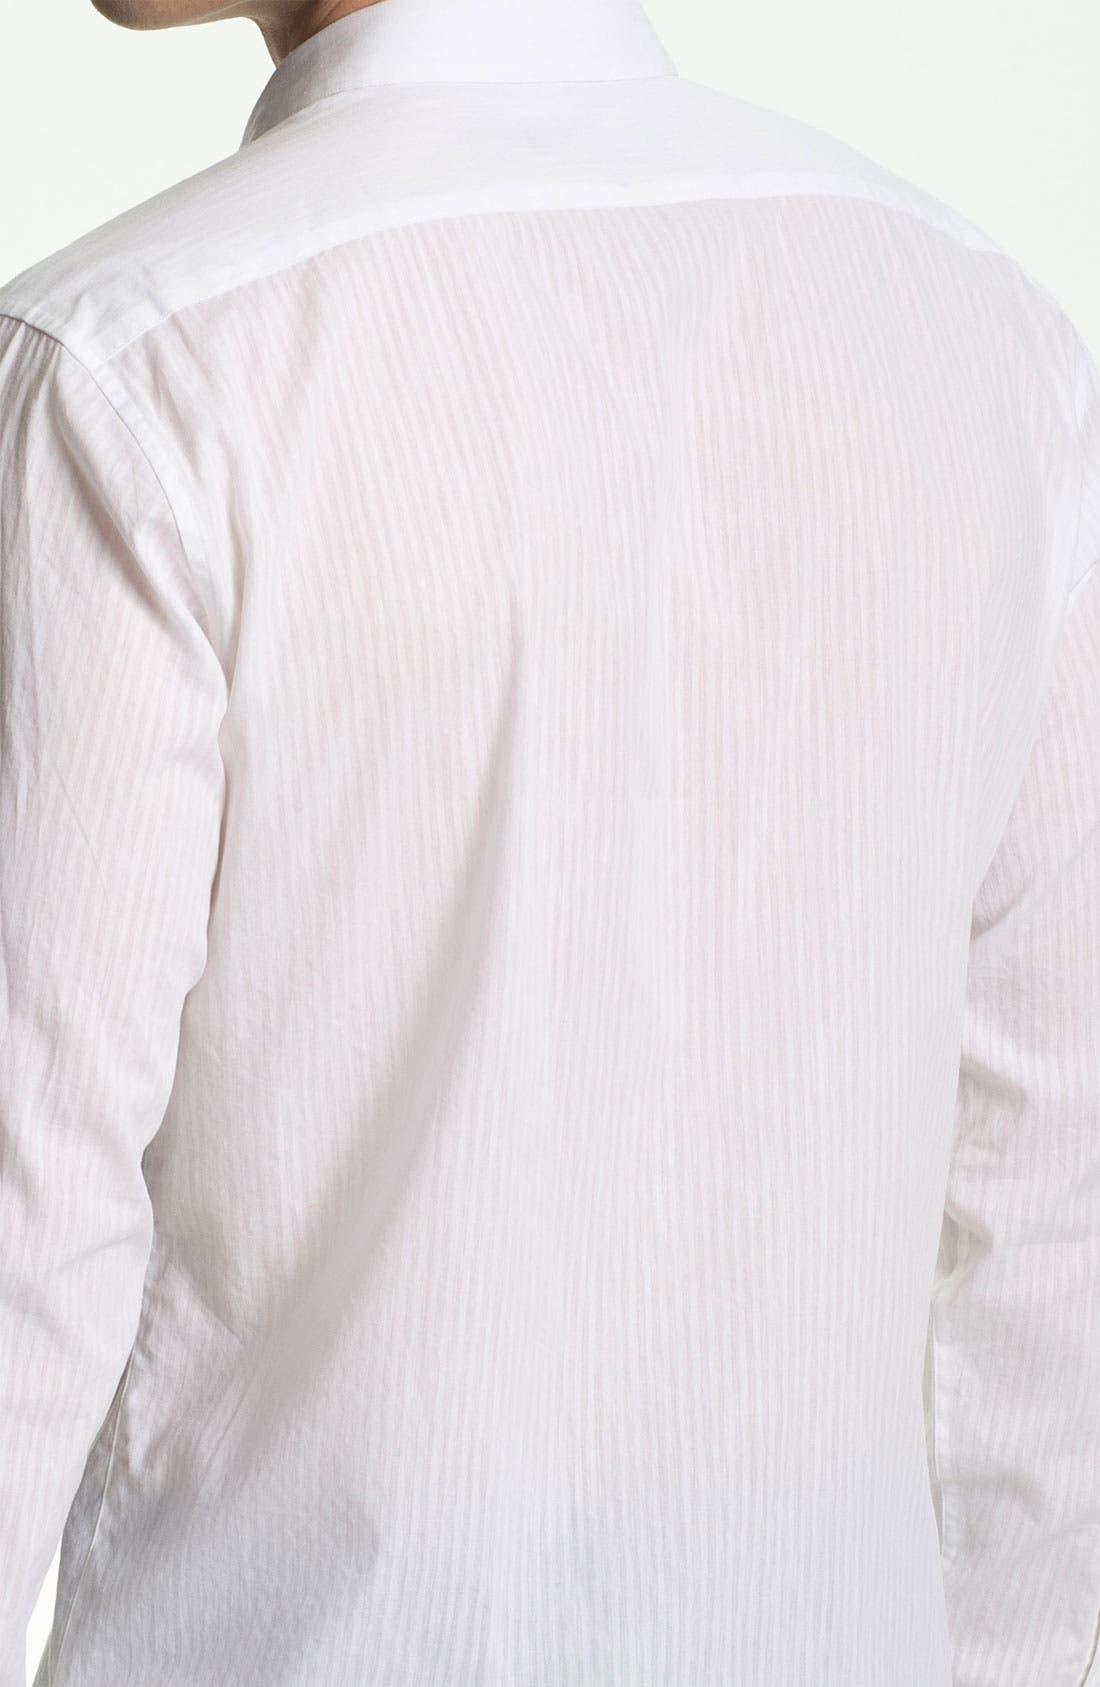 Alternate Image 3  - Theory 'Stephan S. Aldine' Trim Fit Cotton & Linen Sport Shirt